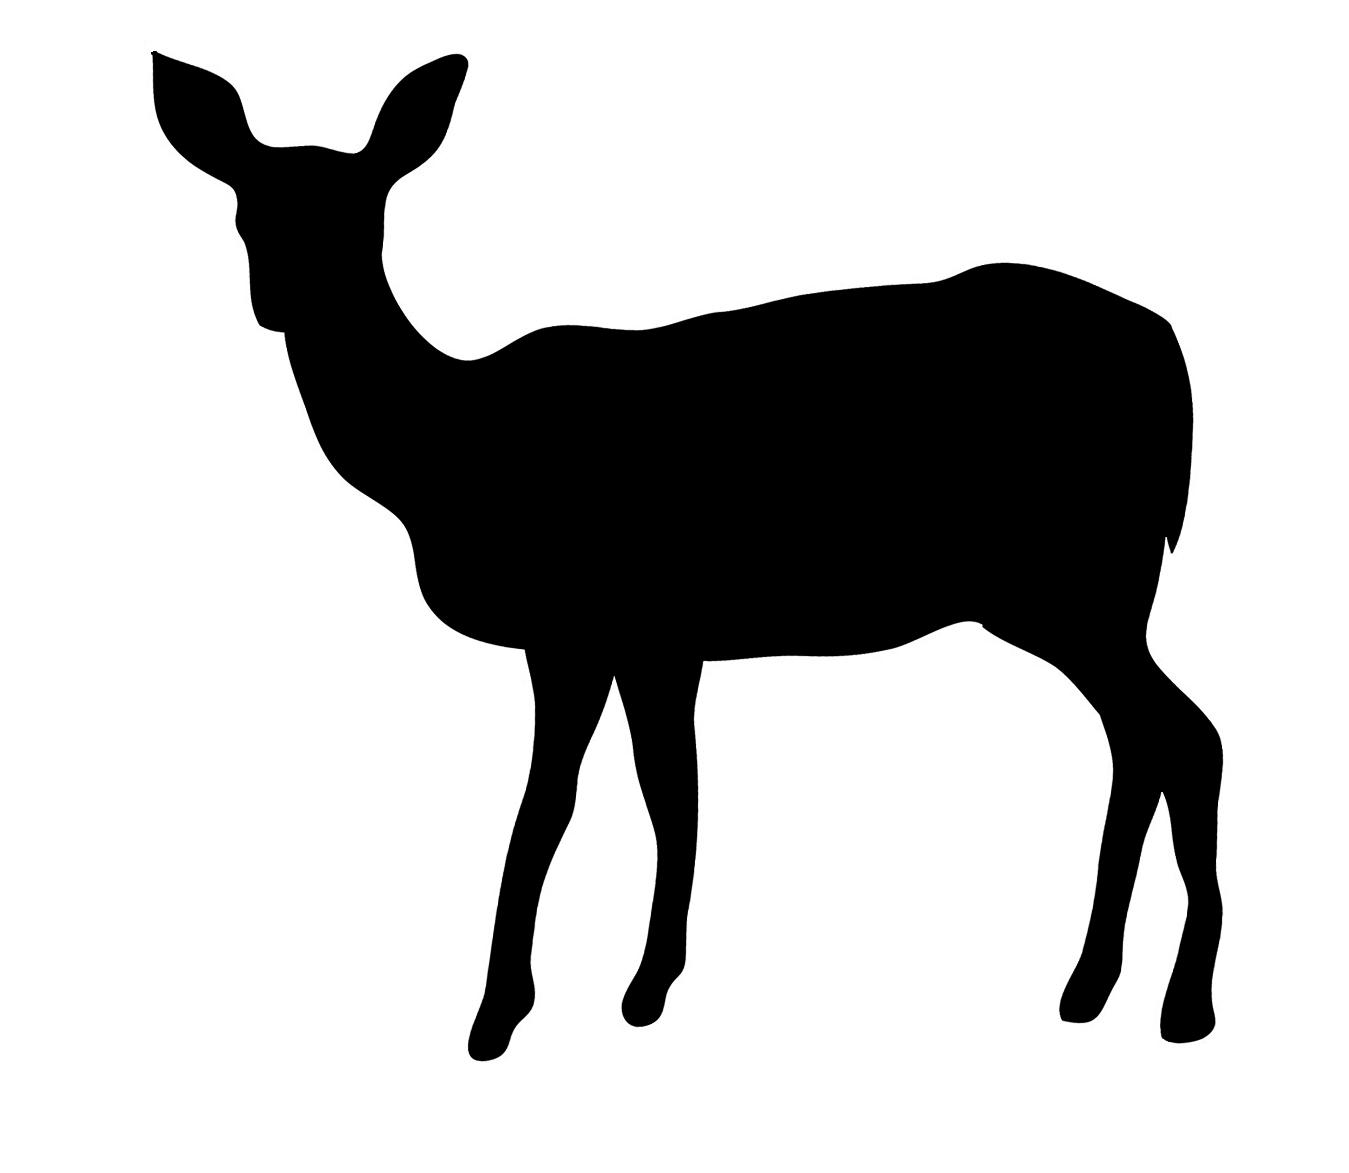 1349x1173 Clip Art Silhouette Animals Animal Lemonize